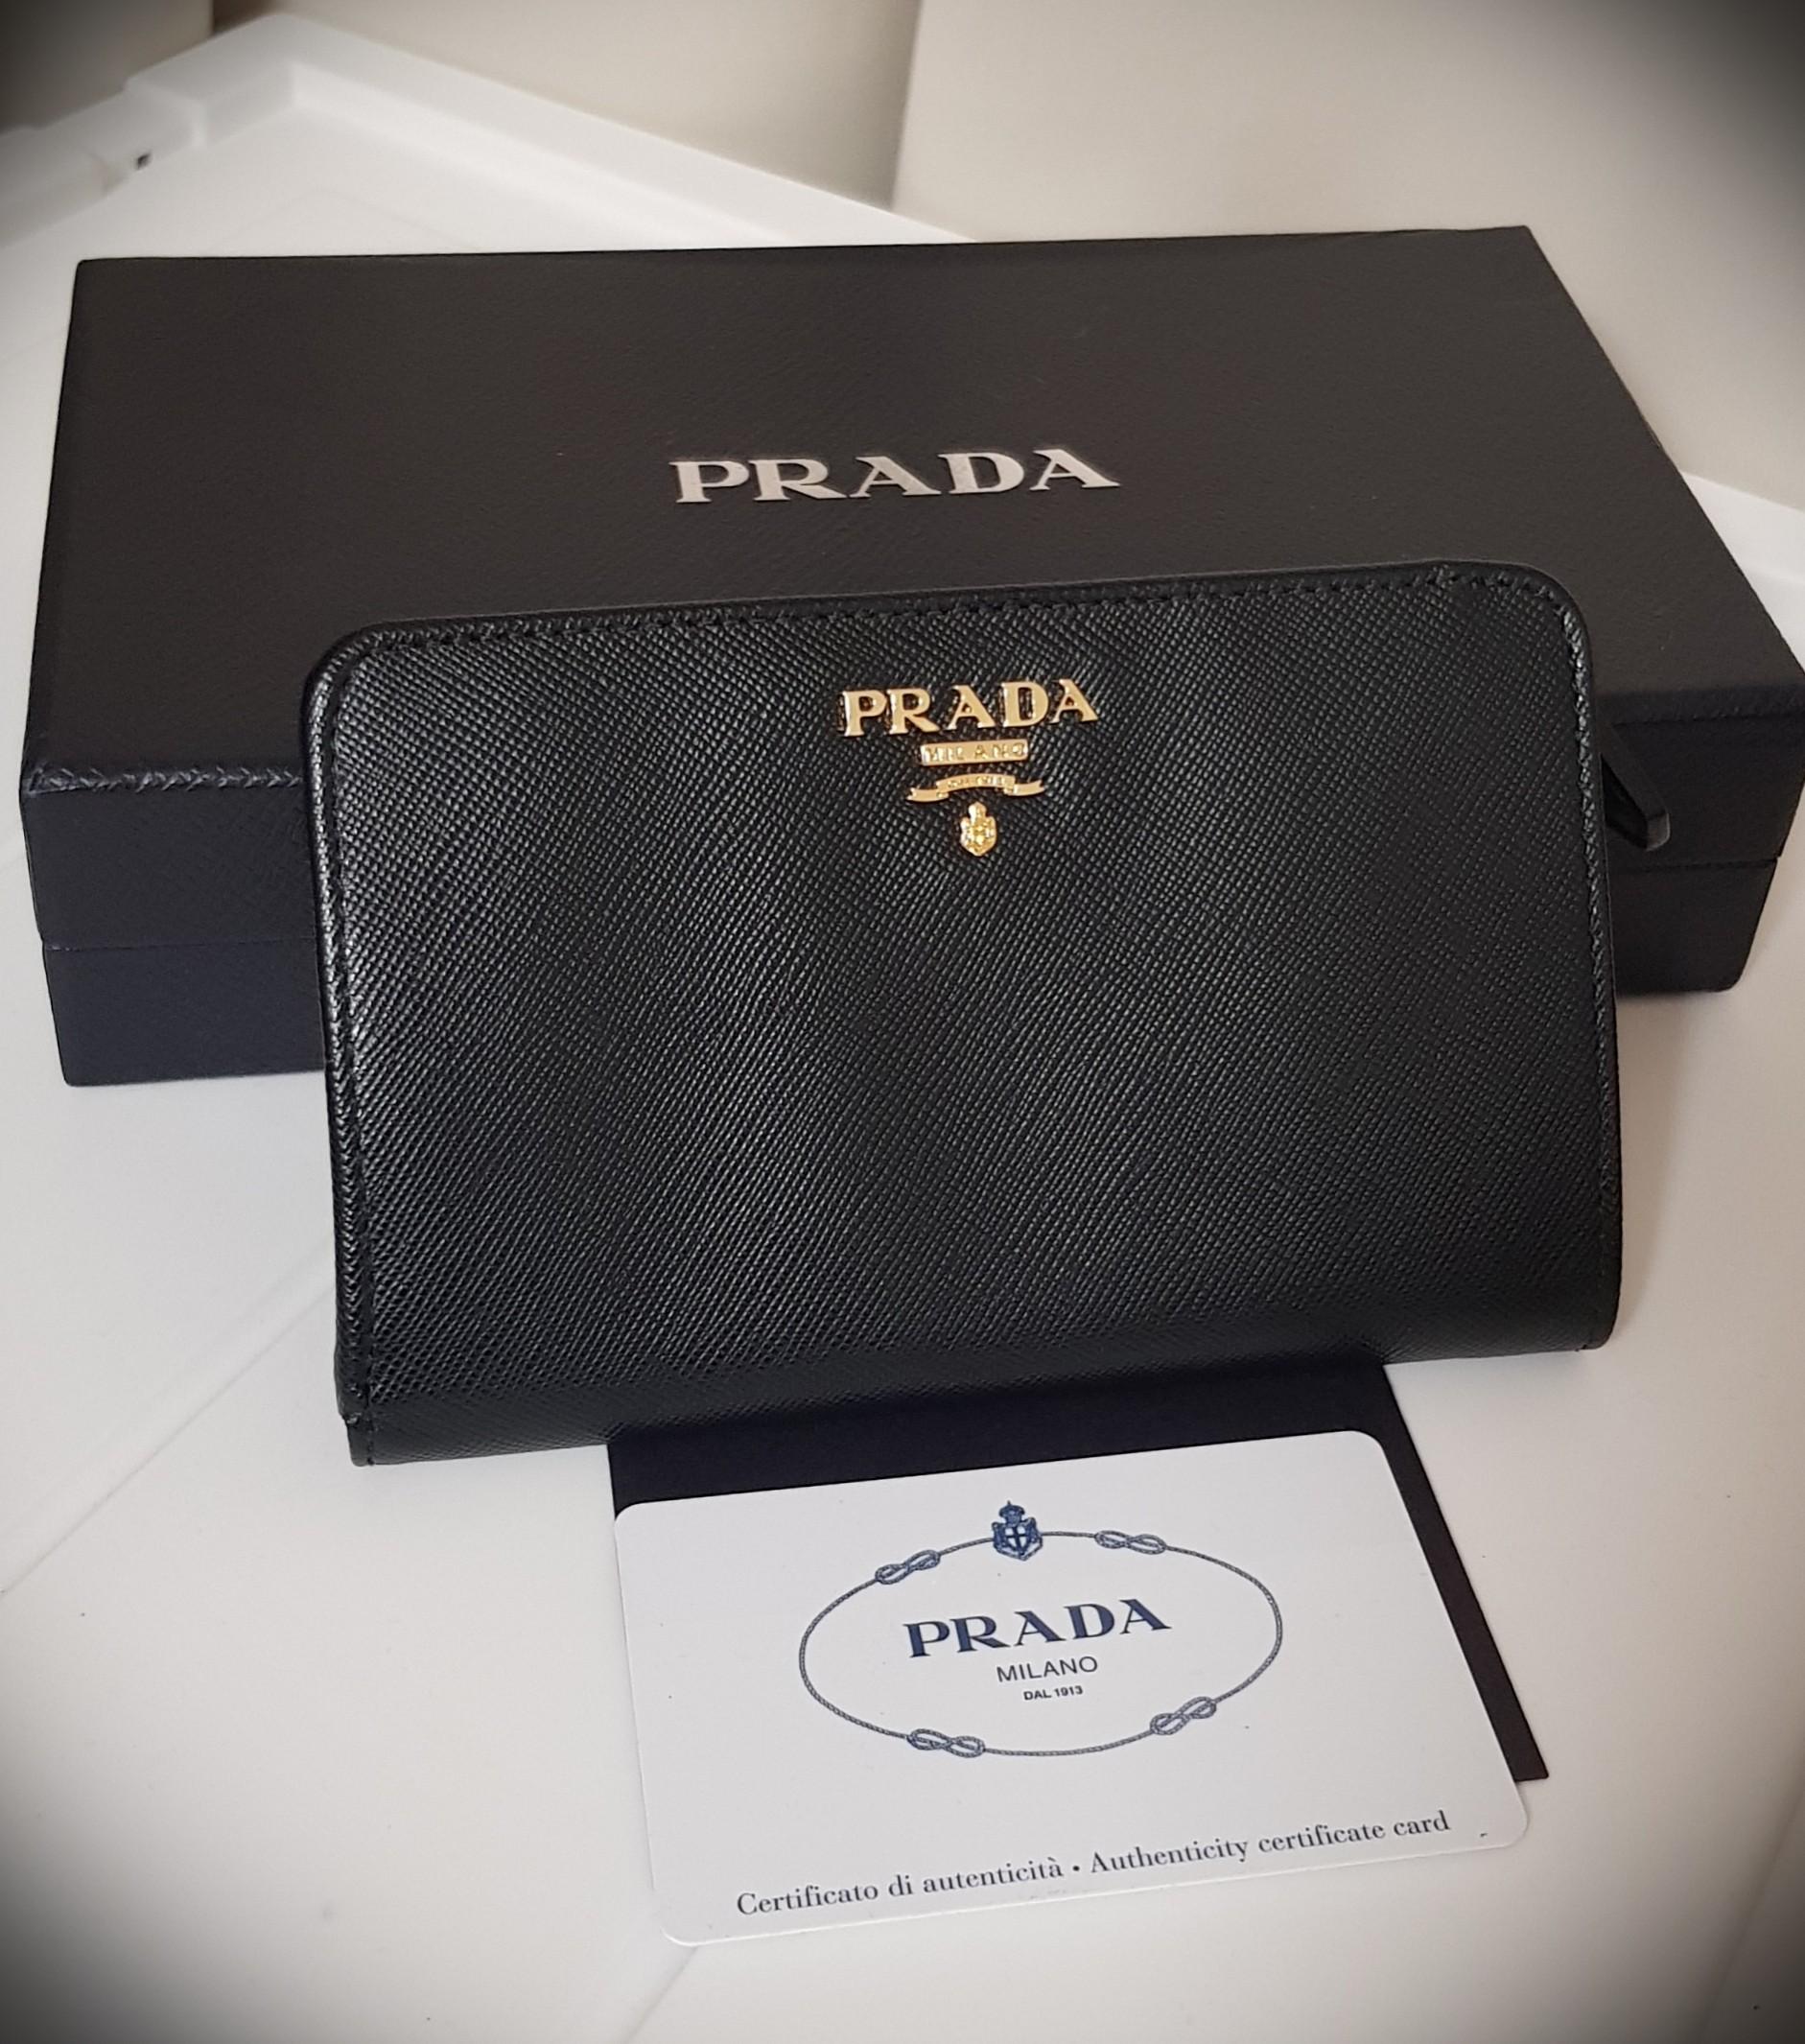 632208b4488e3c Prada Saffiano Wallet, Luxury, Bags & Wallets, Wallets on Carousell